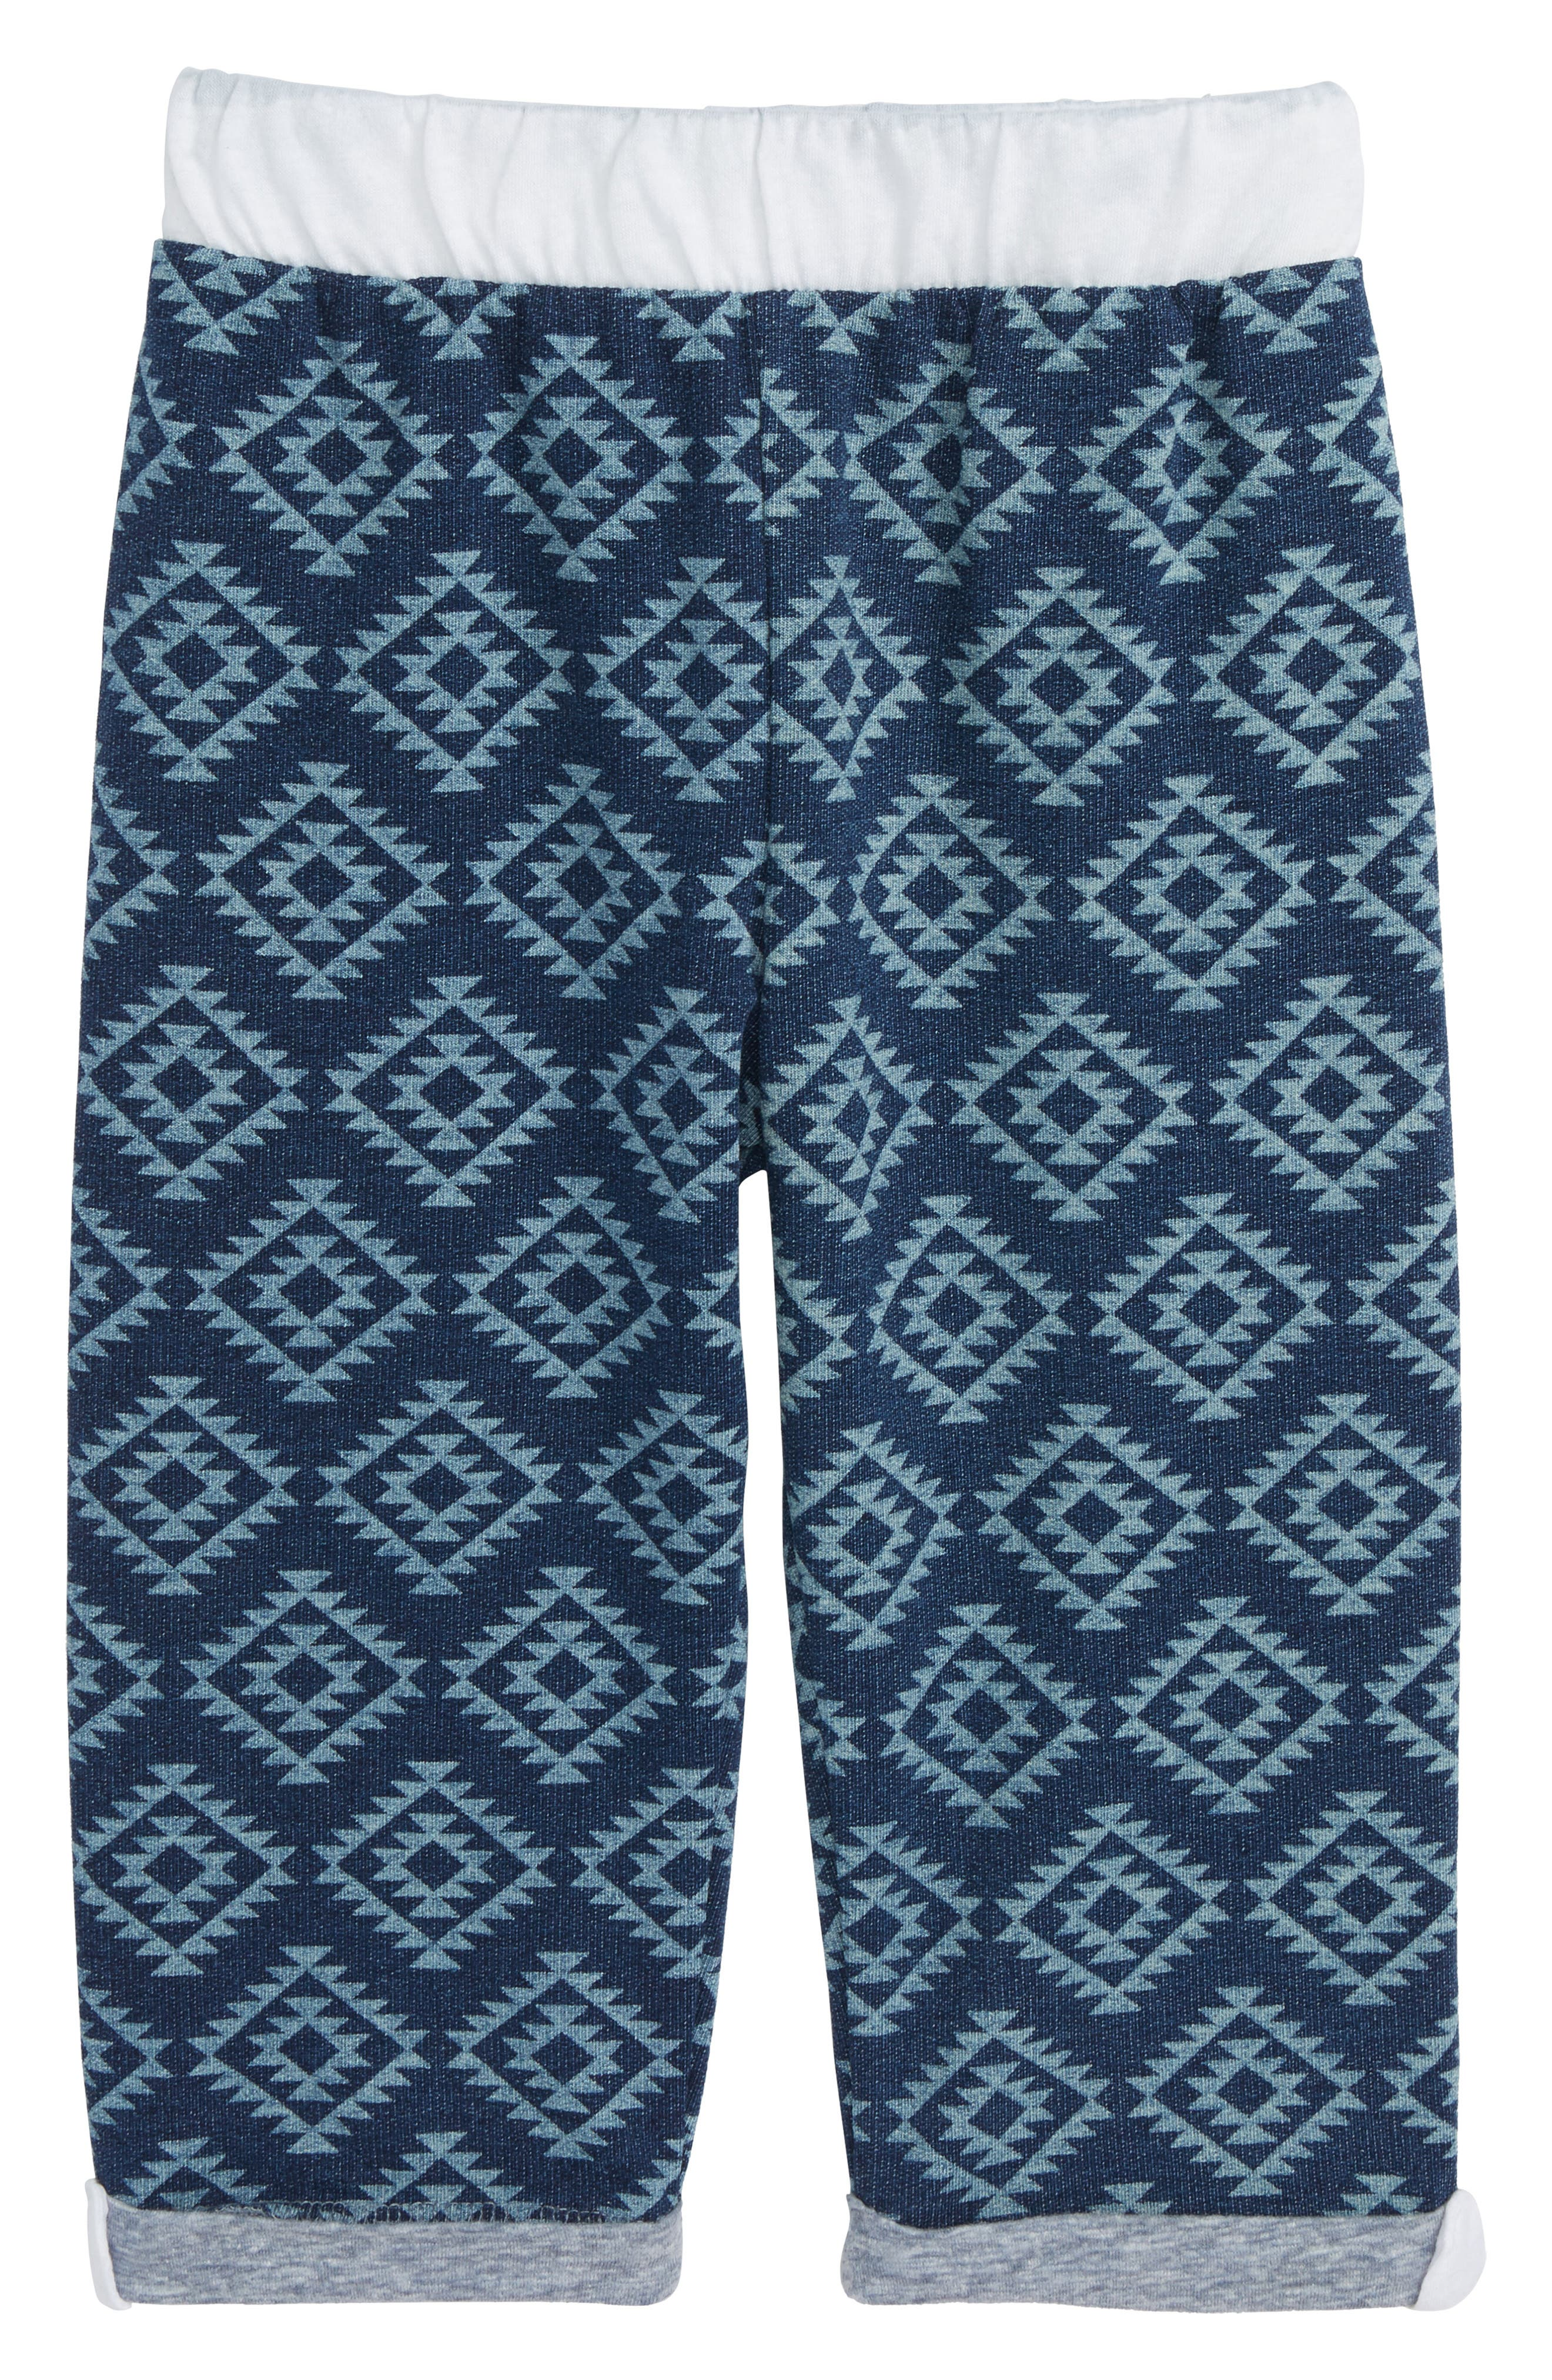 Miki Miette Brody Print Knit Shorts (Toddler Boys, Little Boys & Big Boys)